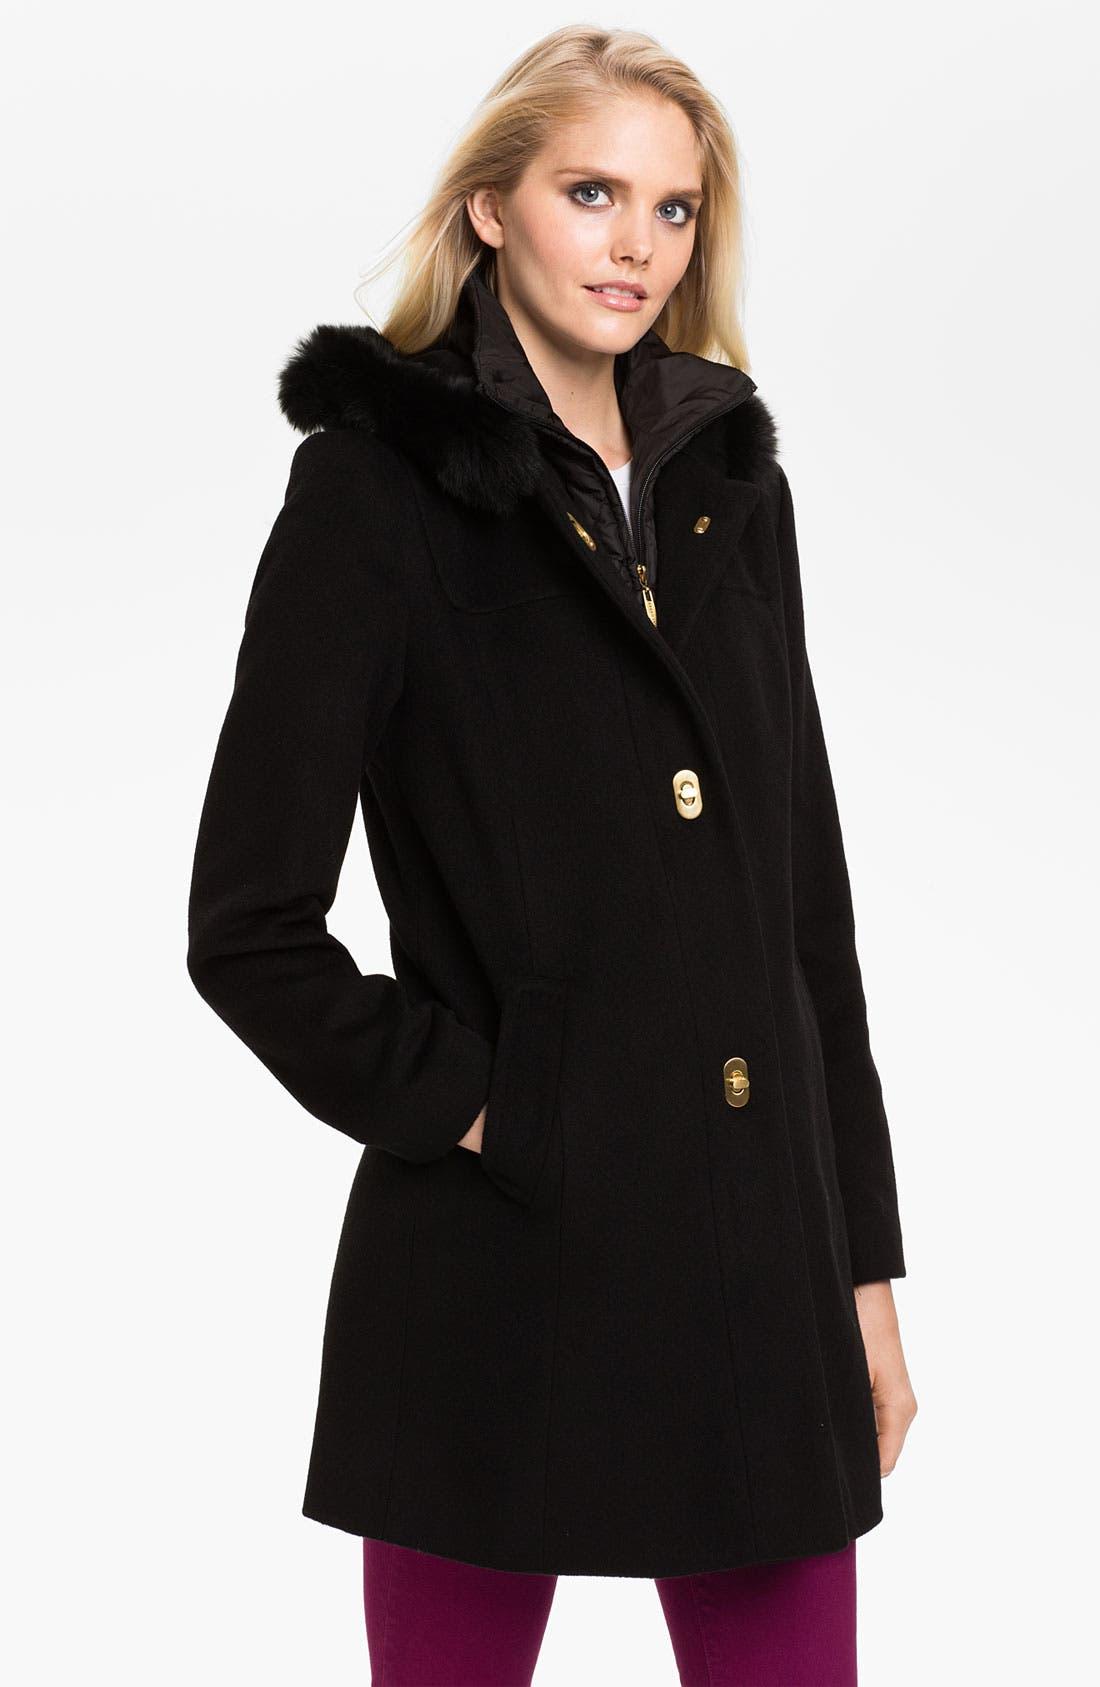 Main Image - Ellen Tracy Turnkey Coat with Fur Trim Hood (Online Exclusive)